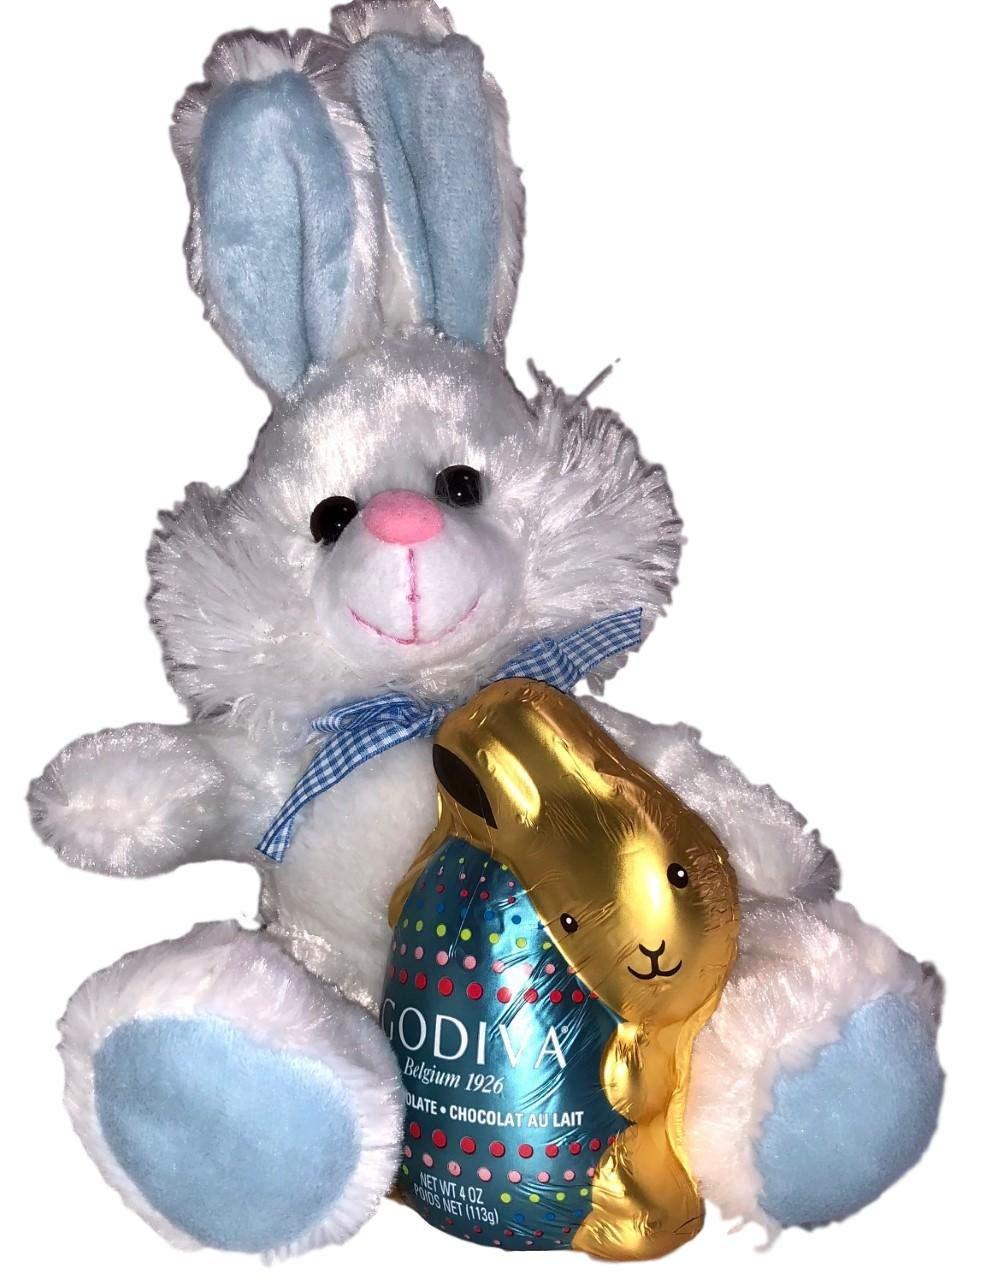 Amazoncom 11 Inch Plush Easter Bunny Rabbit With Godiva